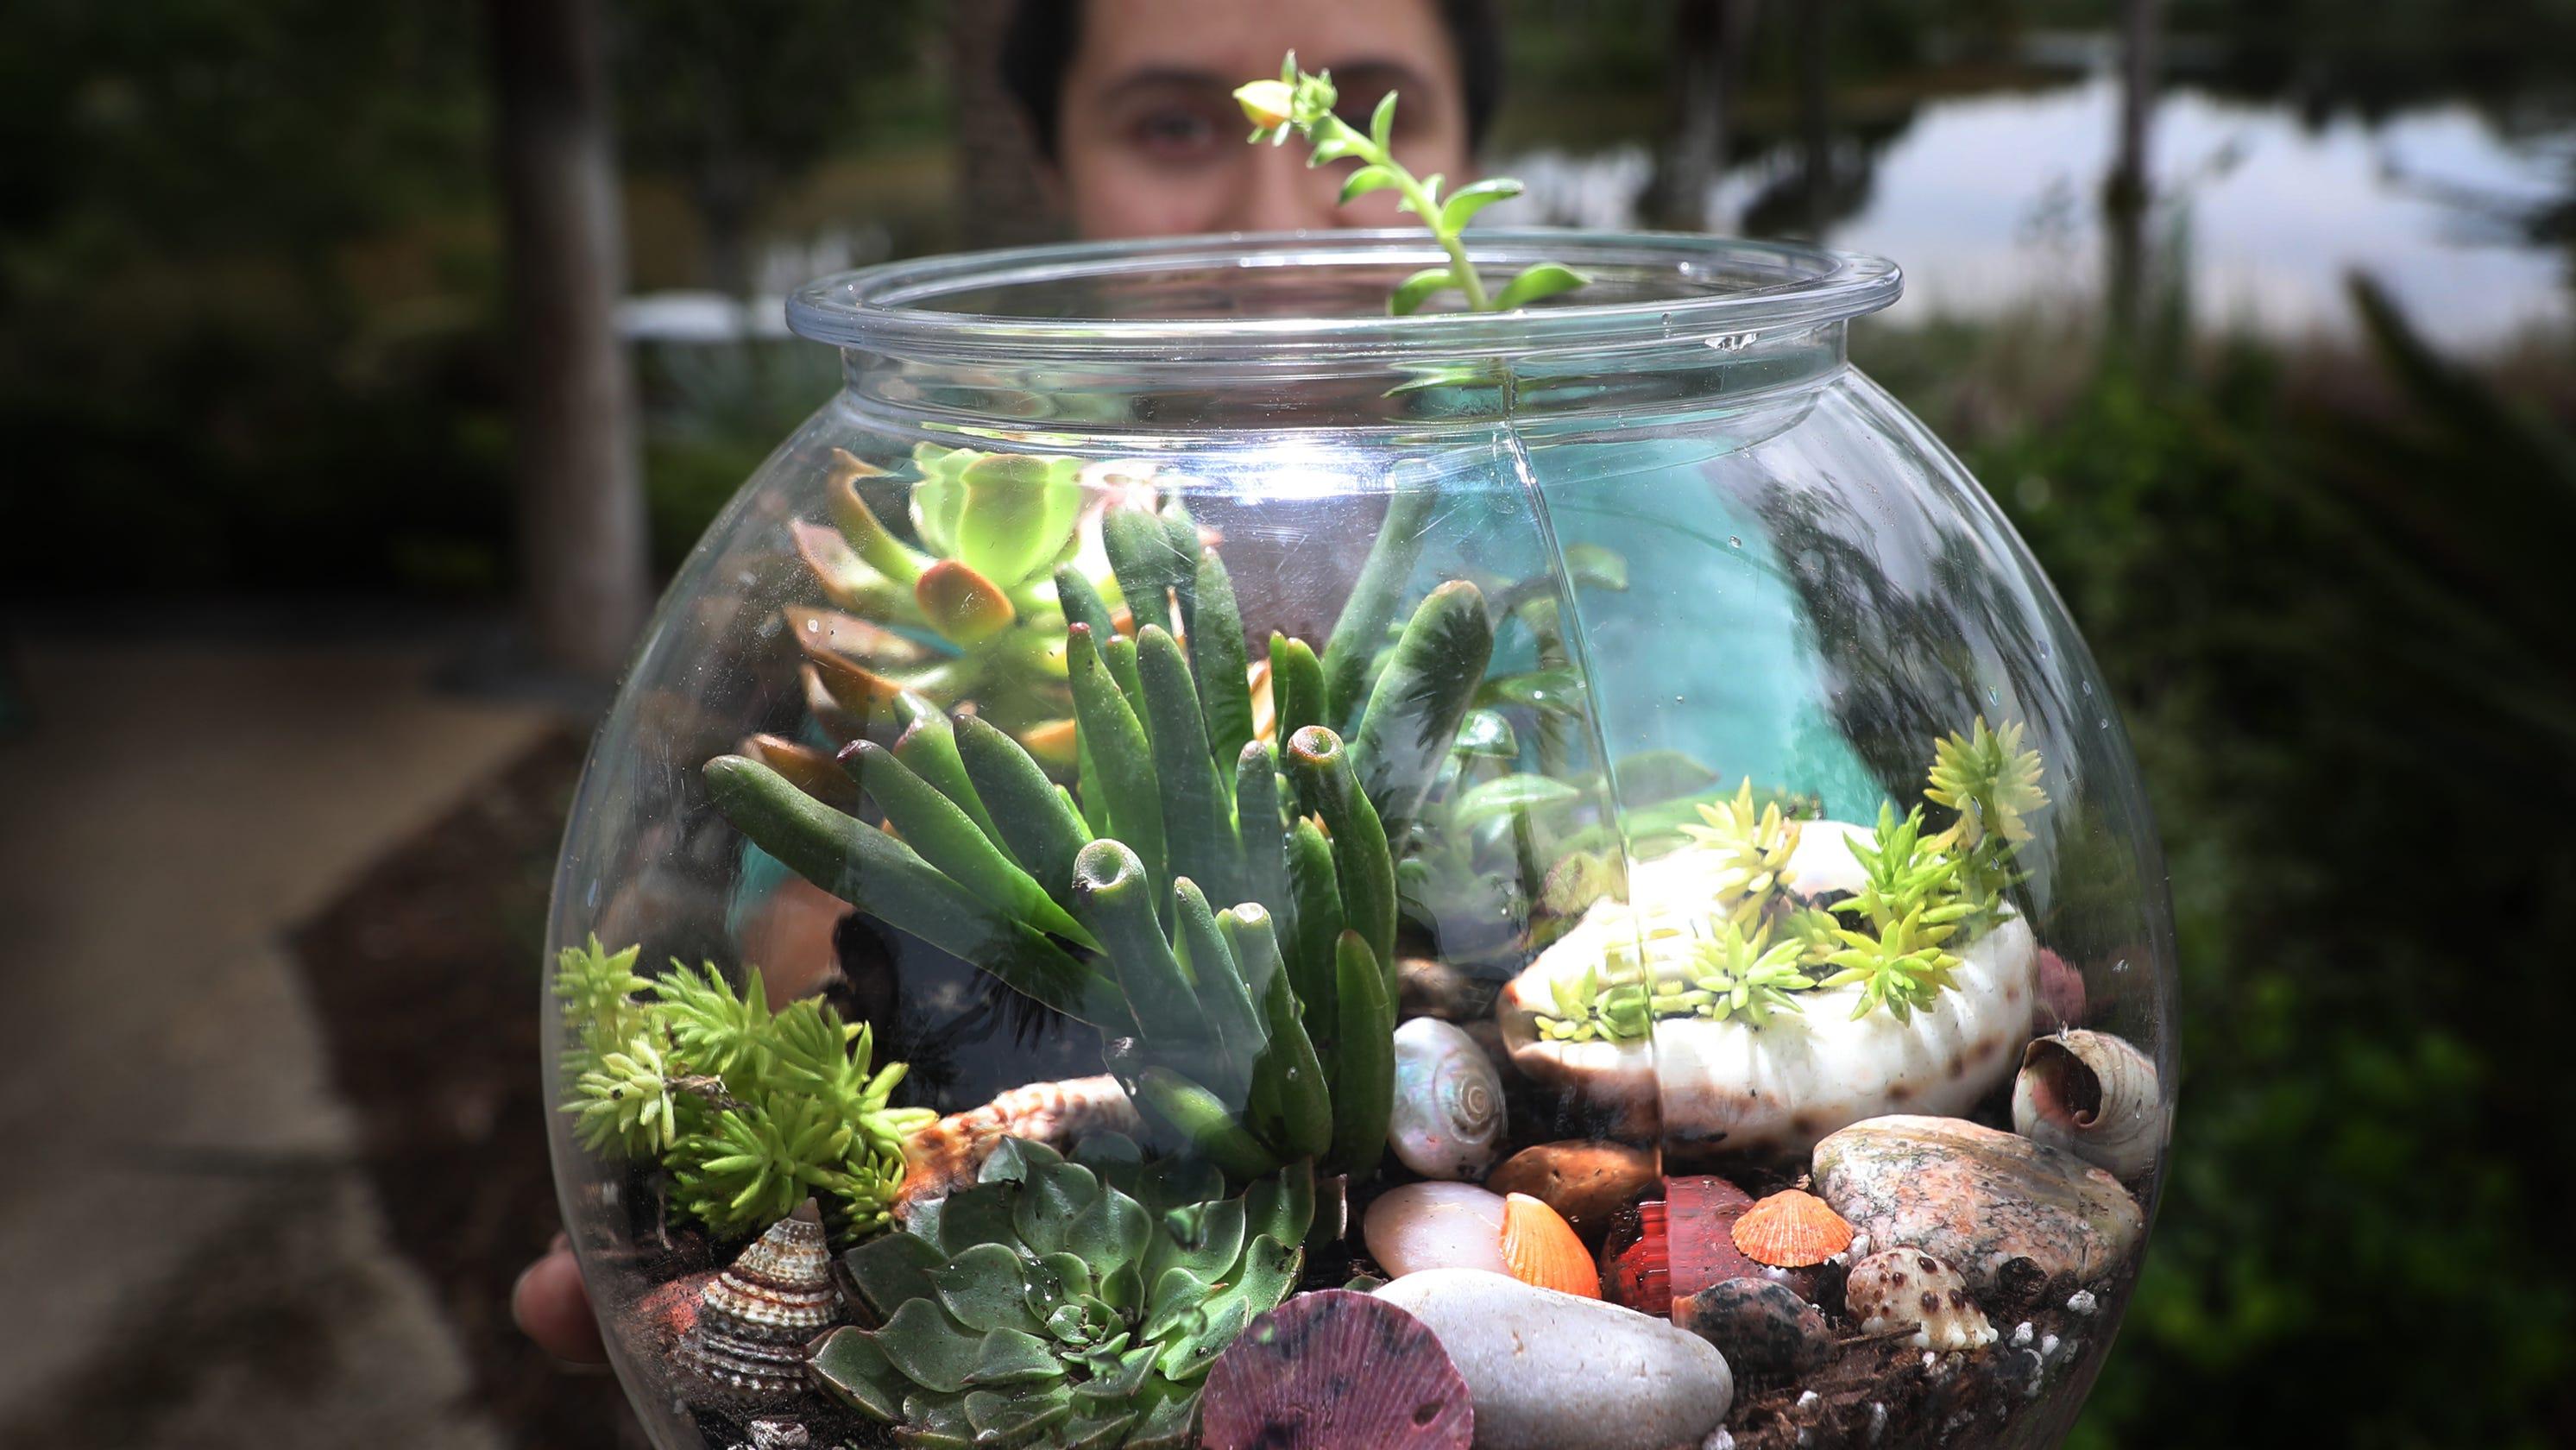 Learn How To Make A Terrarium More At Naples Botanical Garden